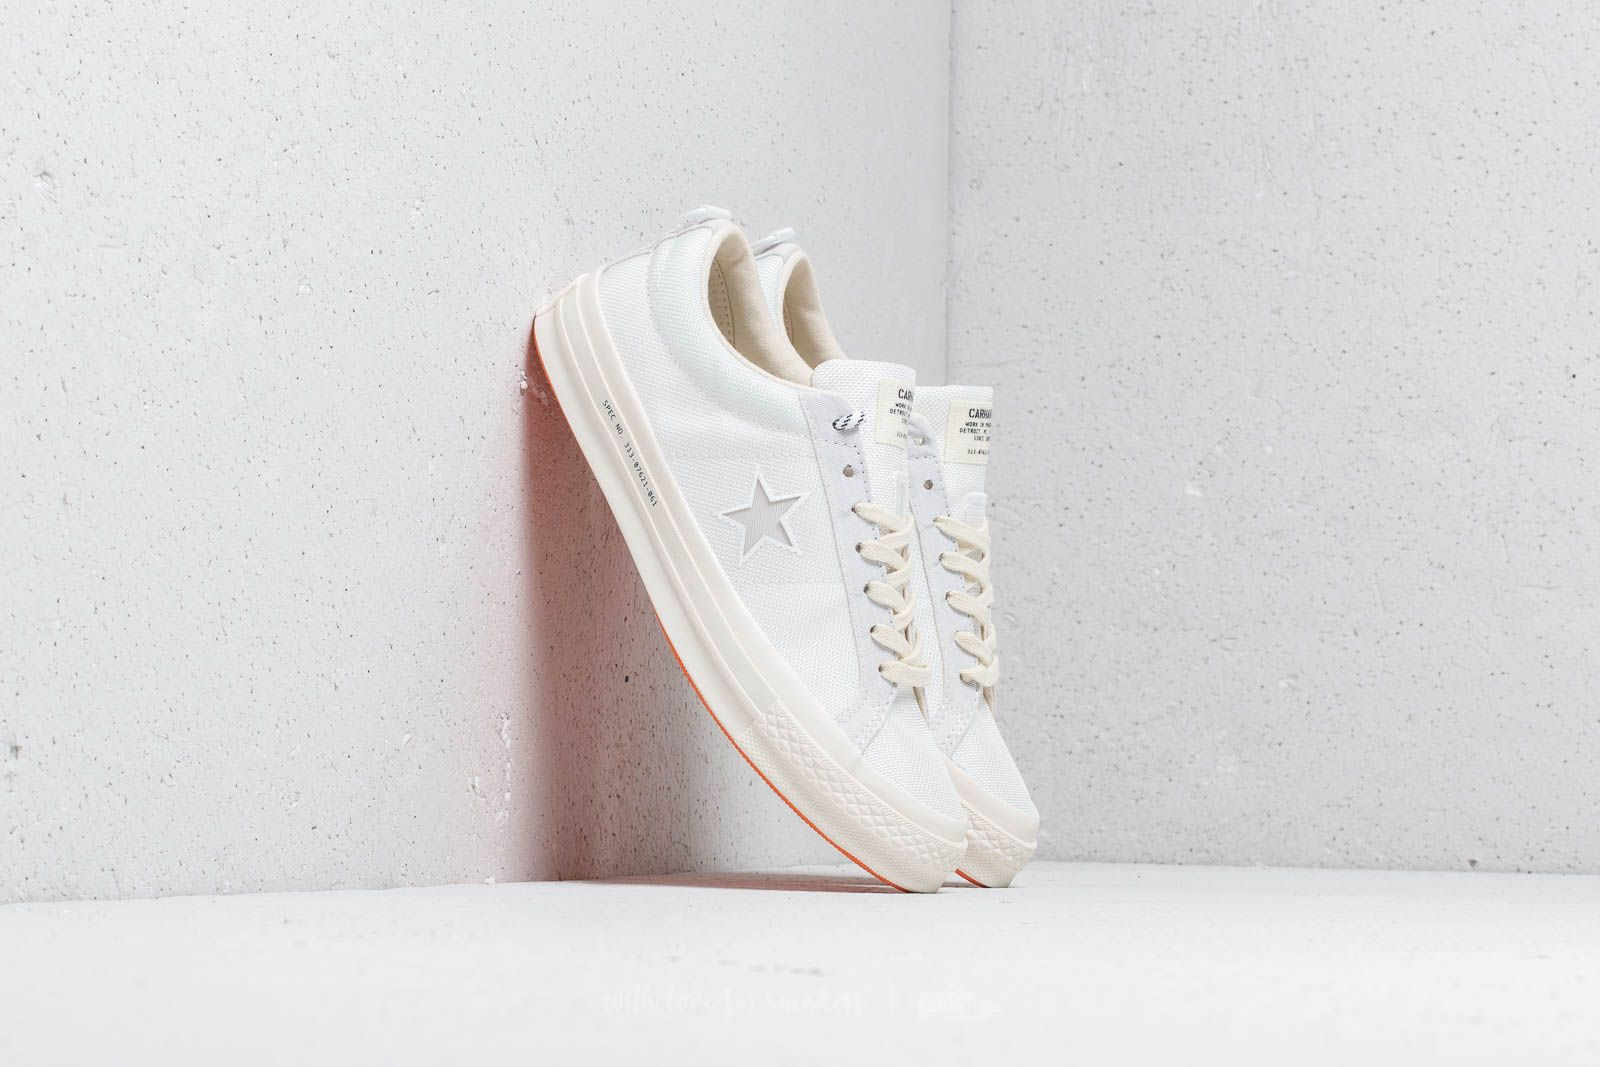 20de43efc9658 Converse x Carhartt WIP One Star OX White  White  Vibrant Orange ...